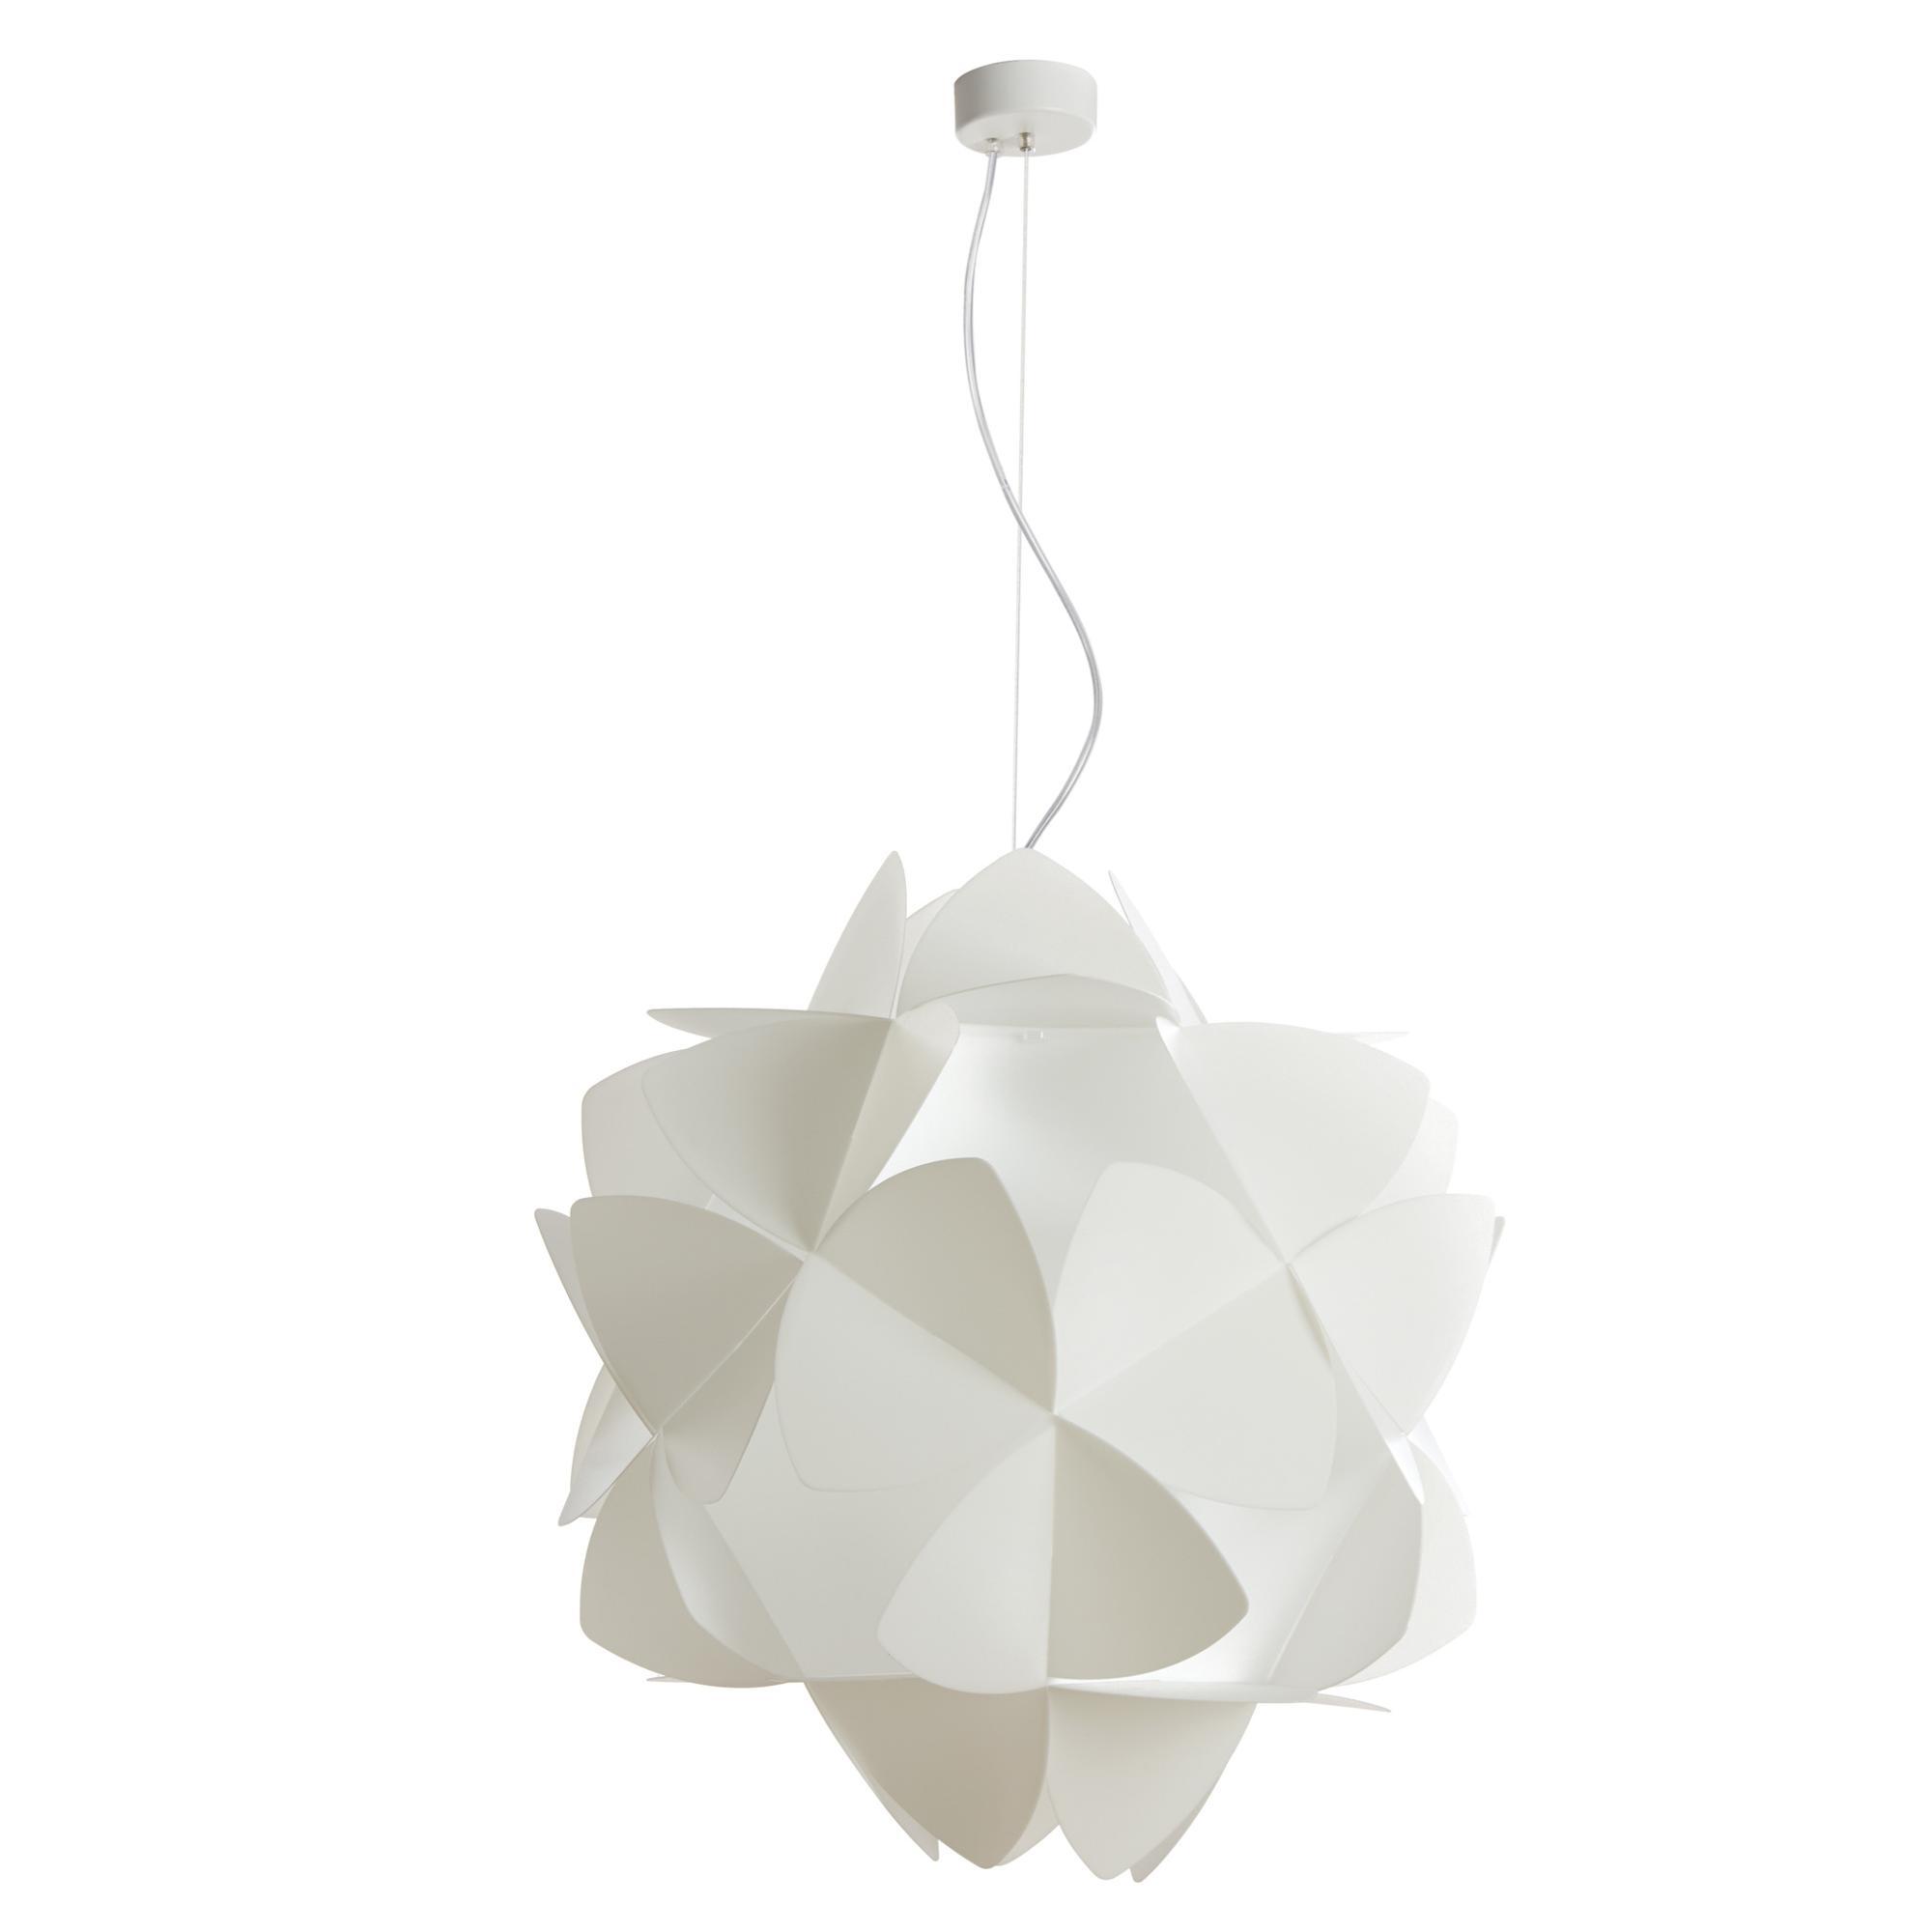 Lampada a sospensione 3 luci sandylex pearl Cotton Light Ø63 cm bianco